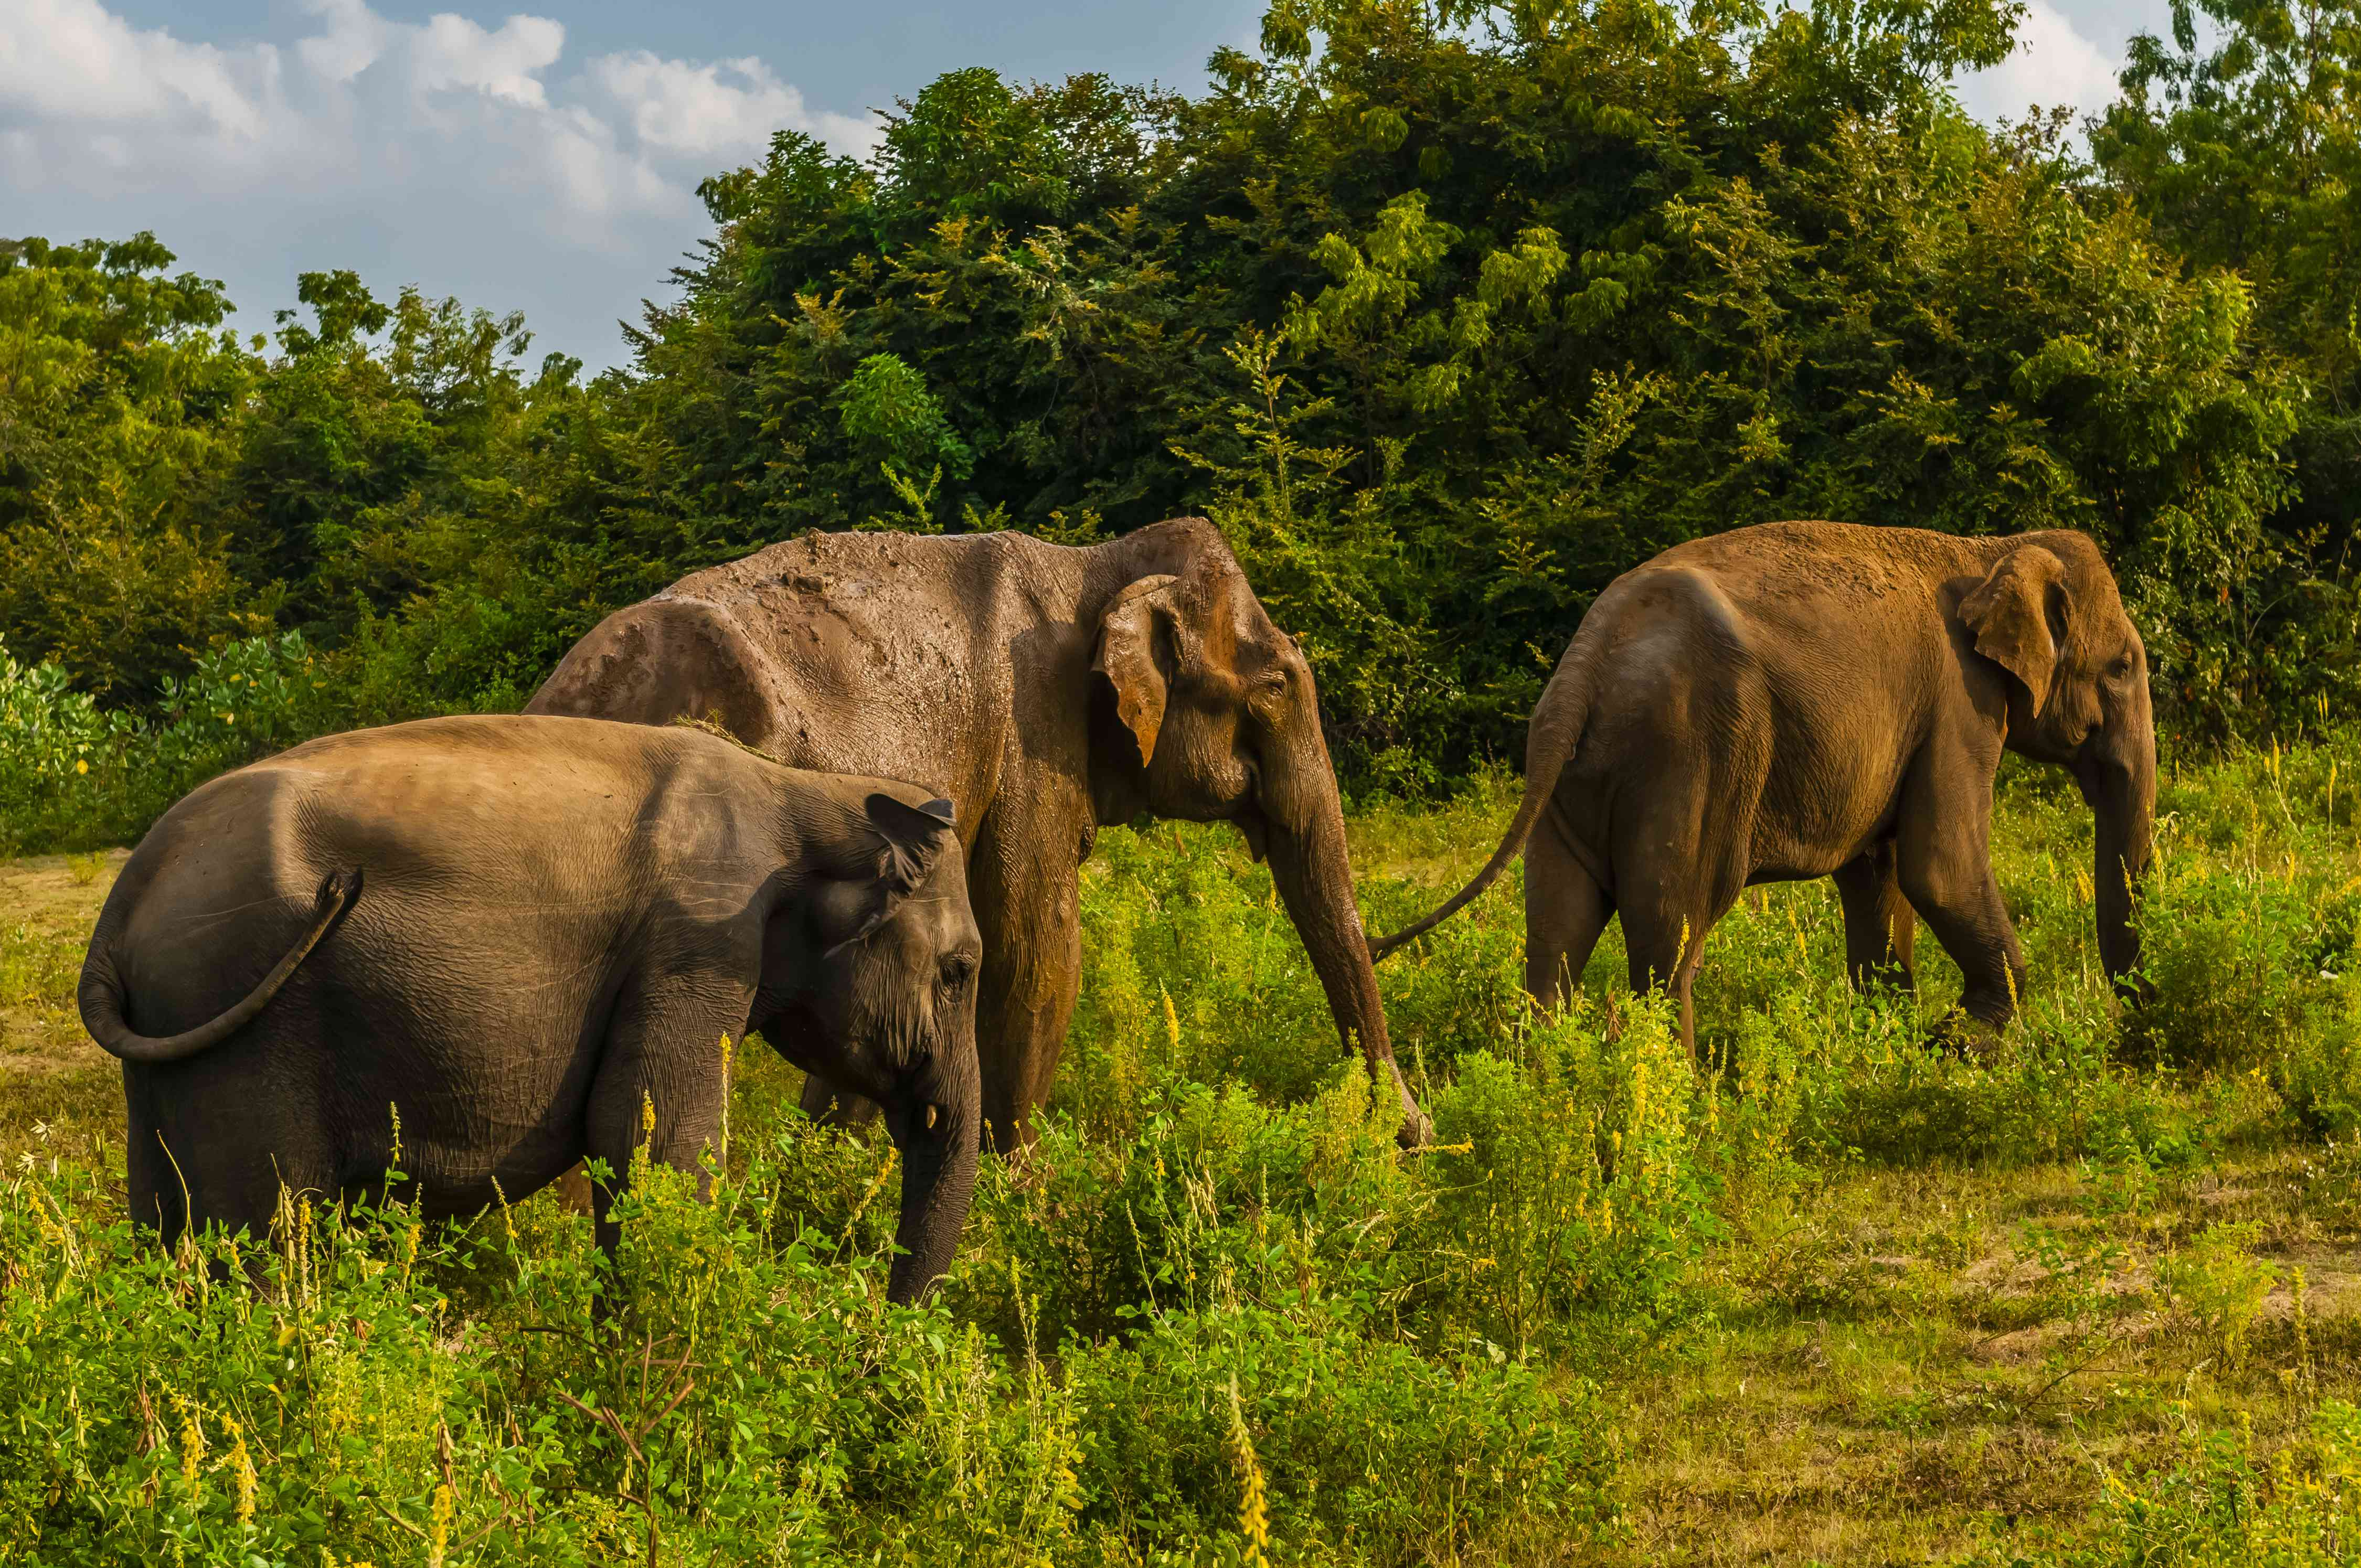 Three elephants in Udawalawe National Park in Sri Lanka